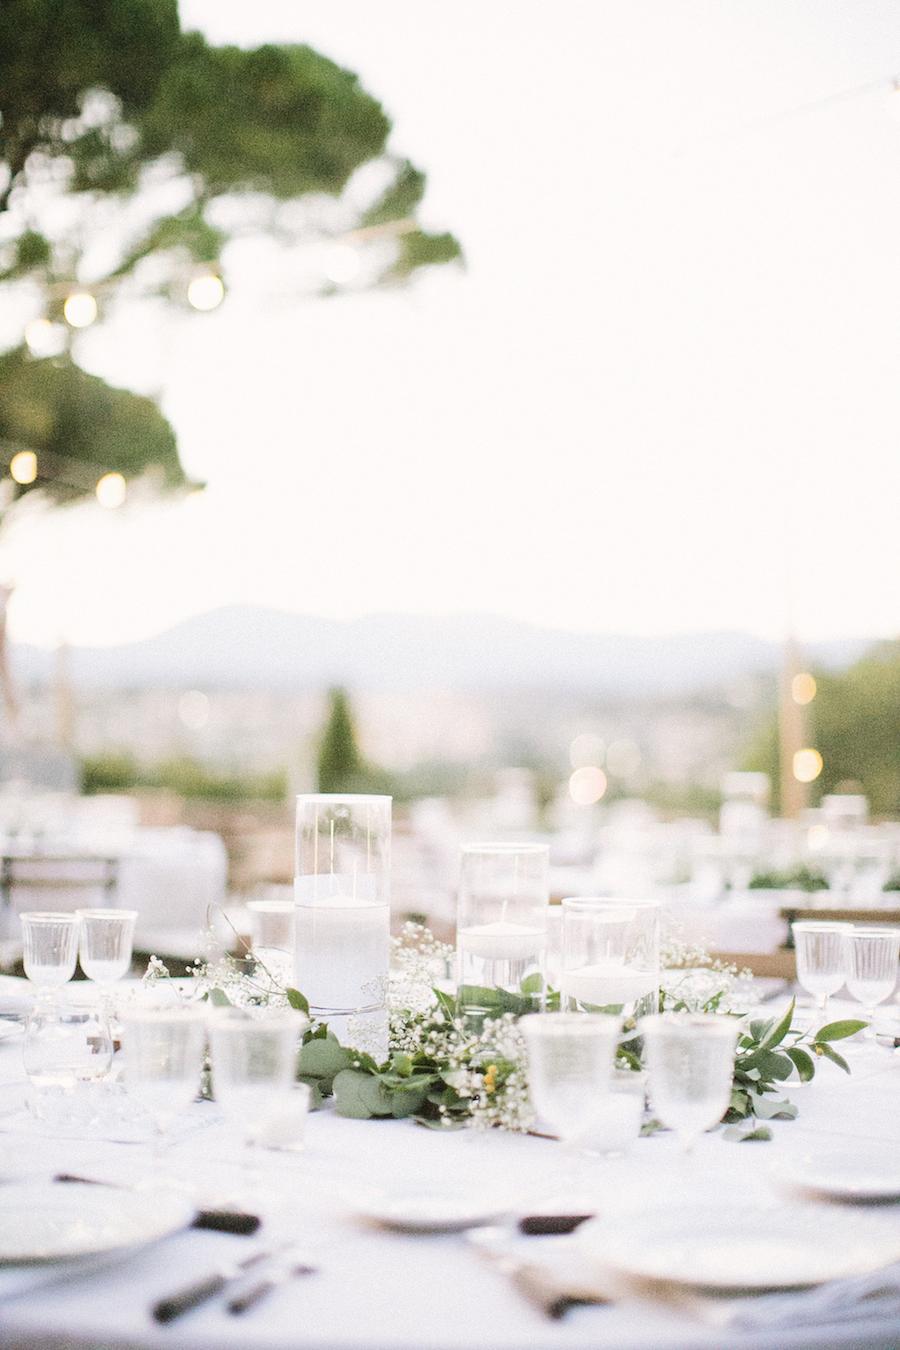 saya-photography-wedding-french-riviera-rustic-antibes-la-bastide-du-roy-115.jpg